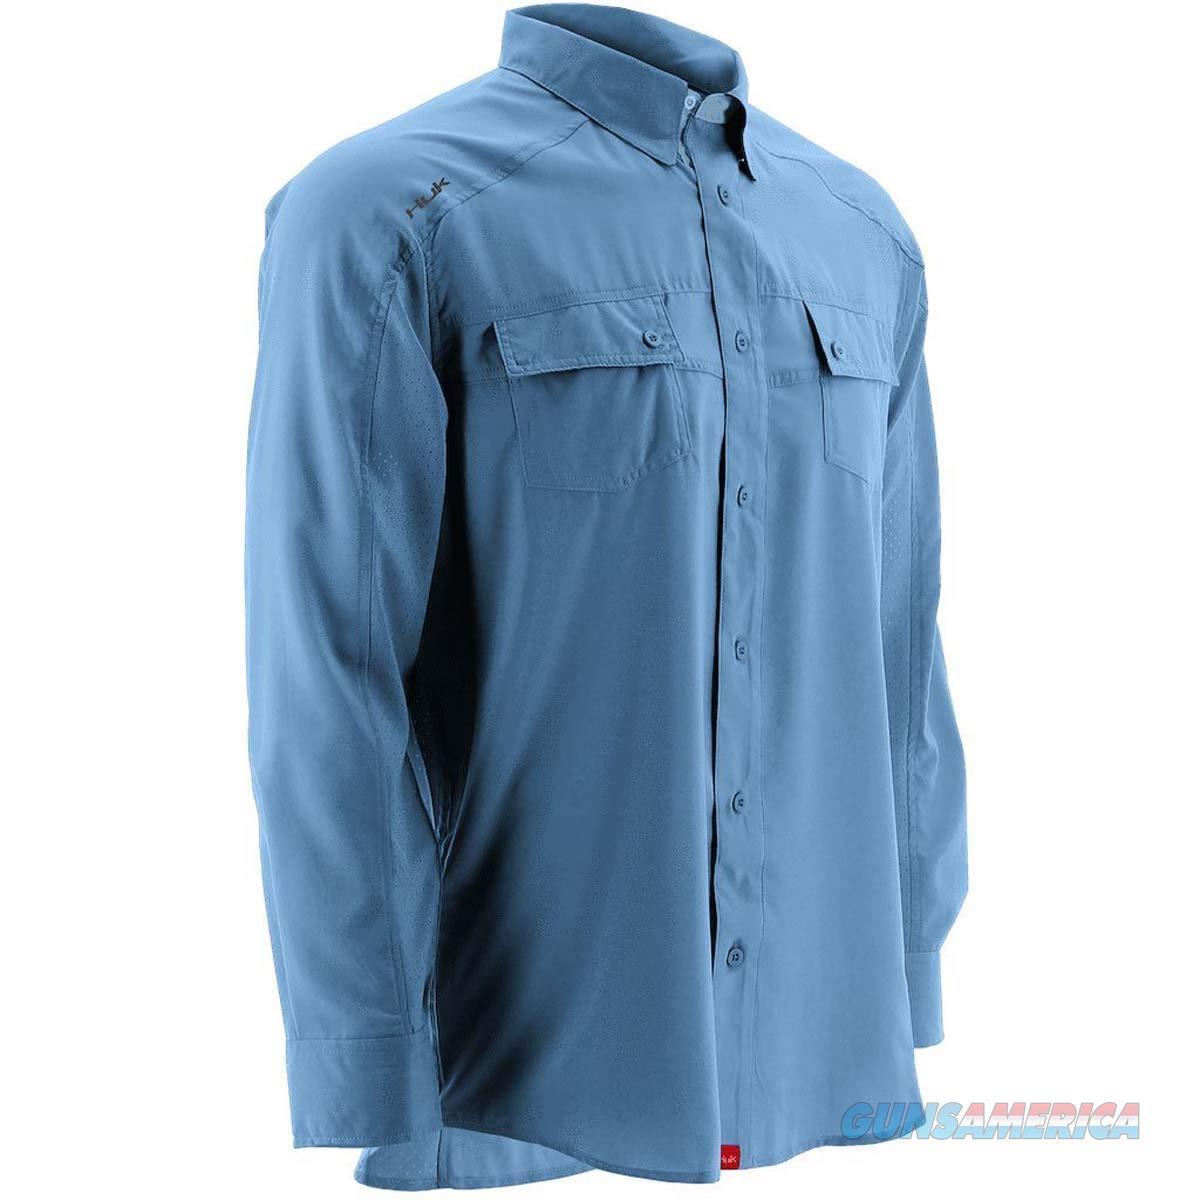 Huk Next Level Button Up Blue XXL  Non-Guns > Hunting Clothing and Equipment > Clothing > Shirts